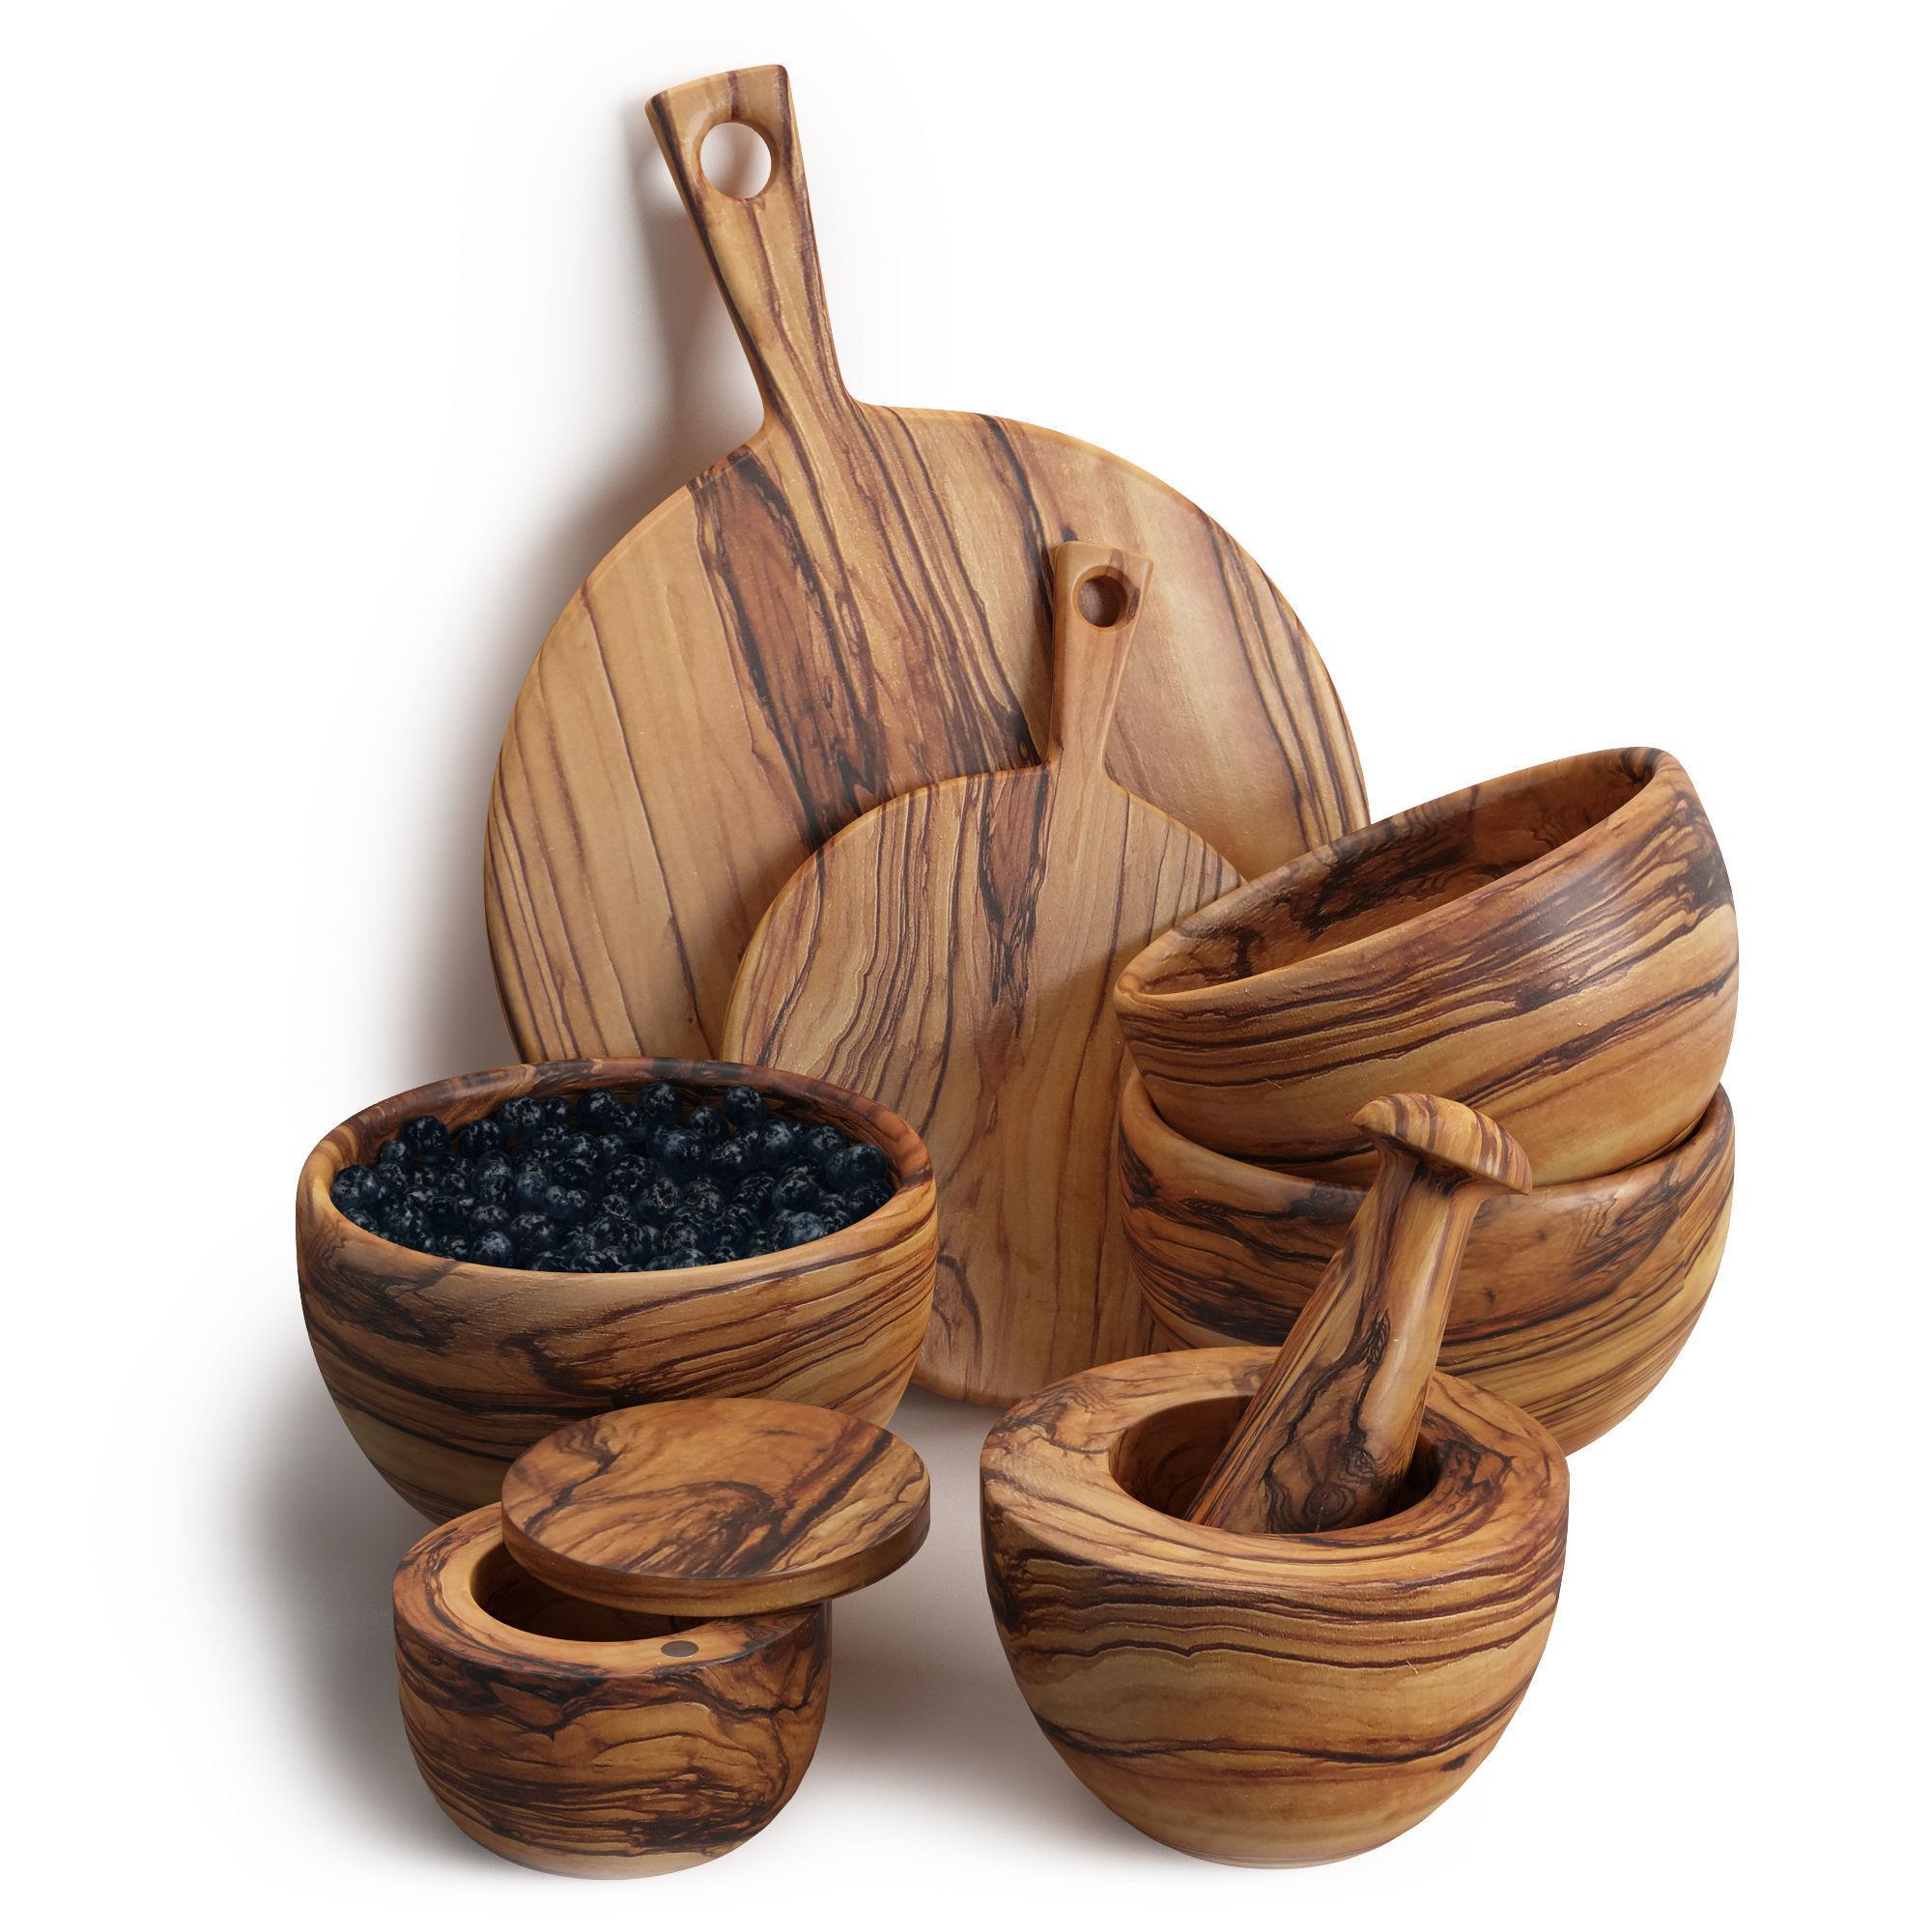 Olive wood kitchen set